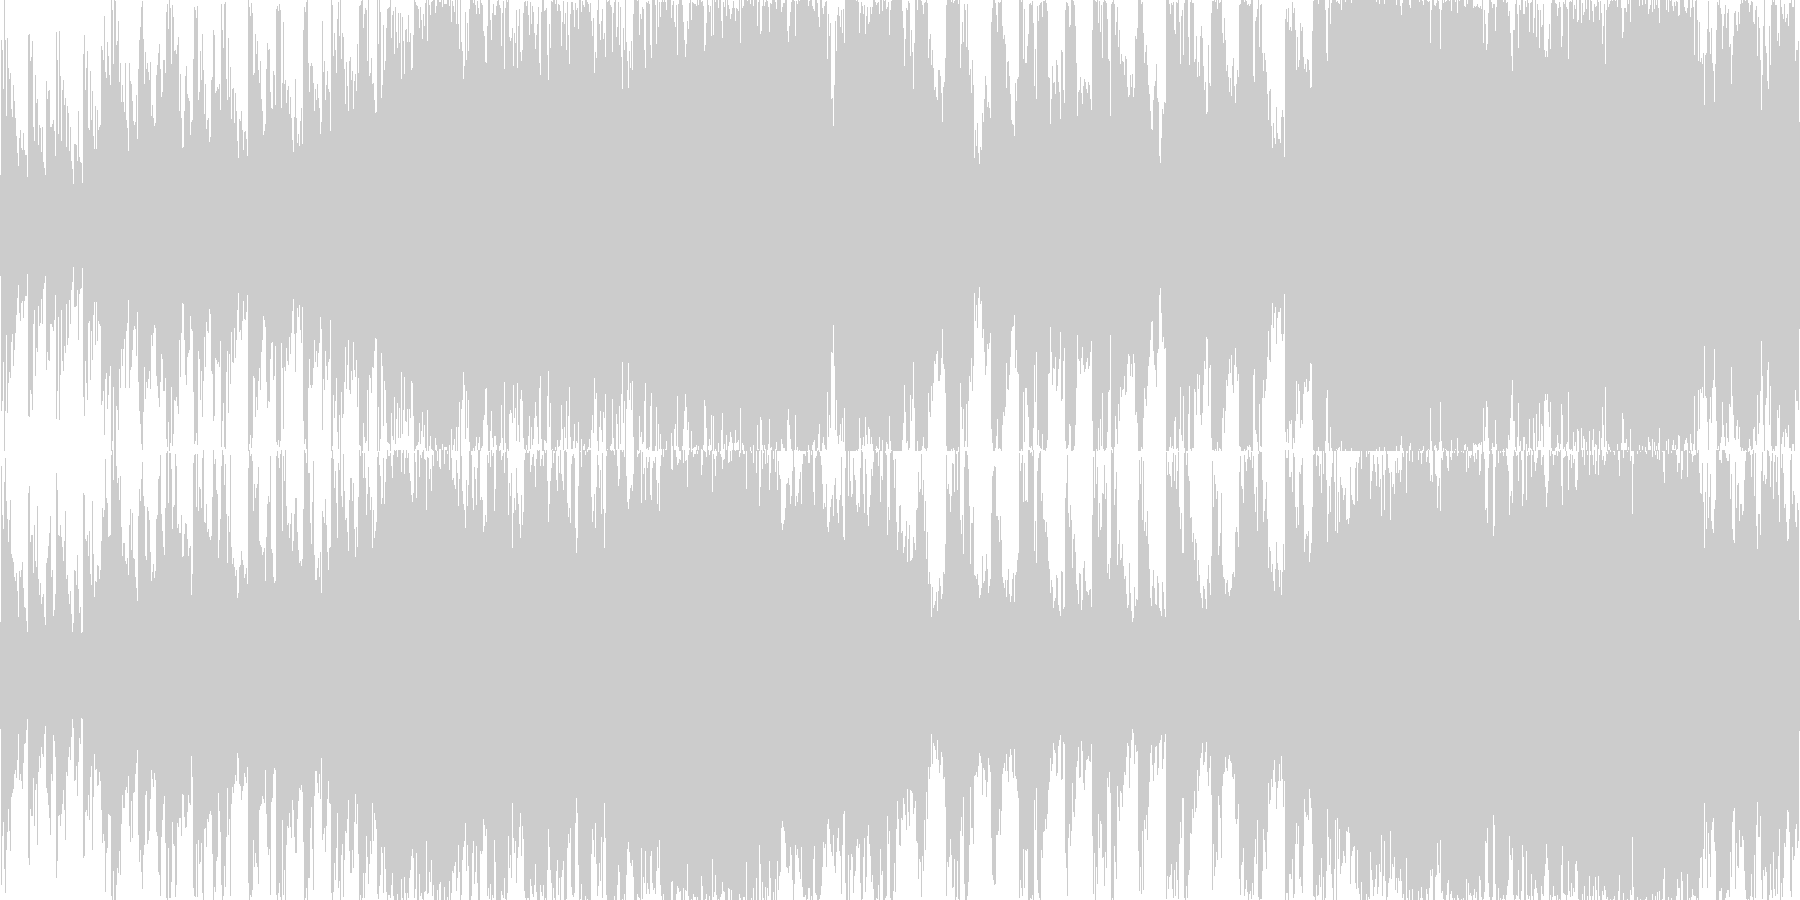 RPGなどフィールド音楽を想定して制作…の未再生の波形